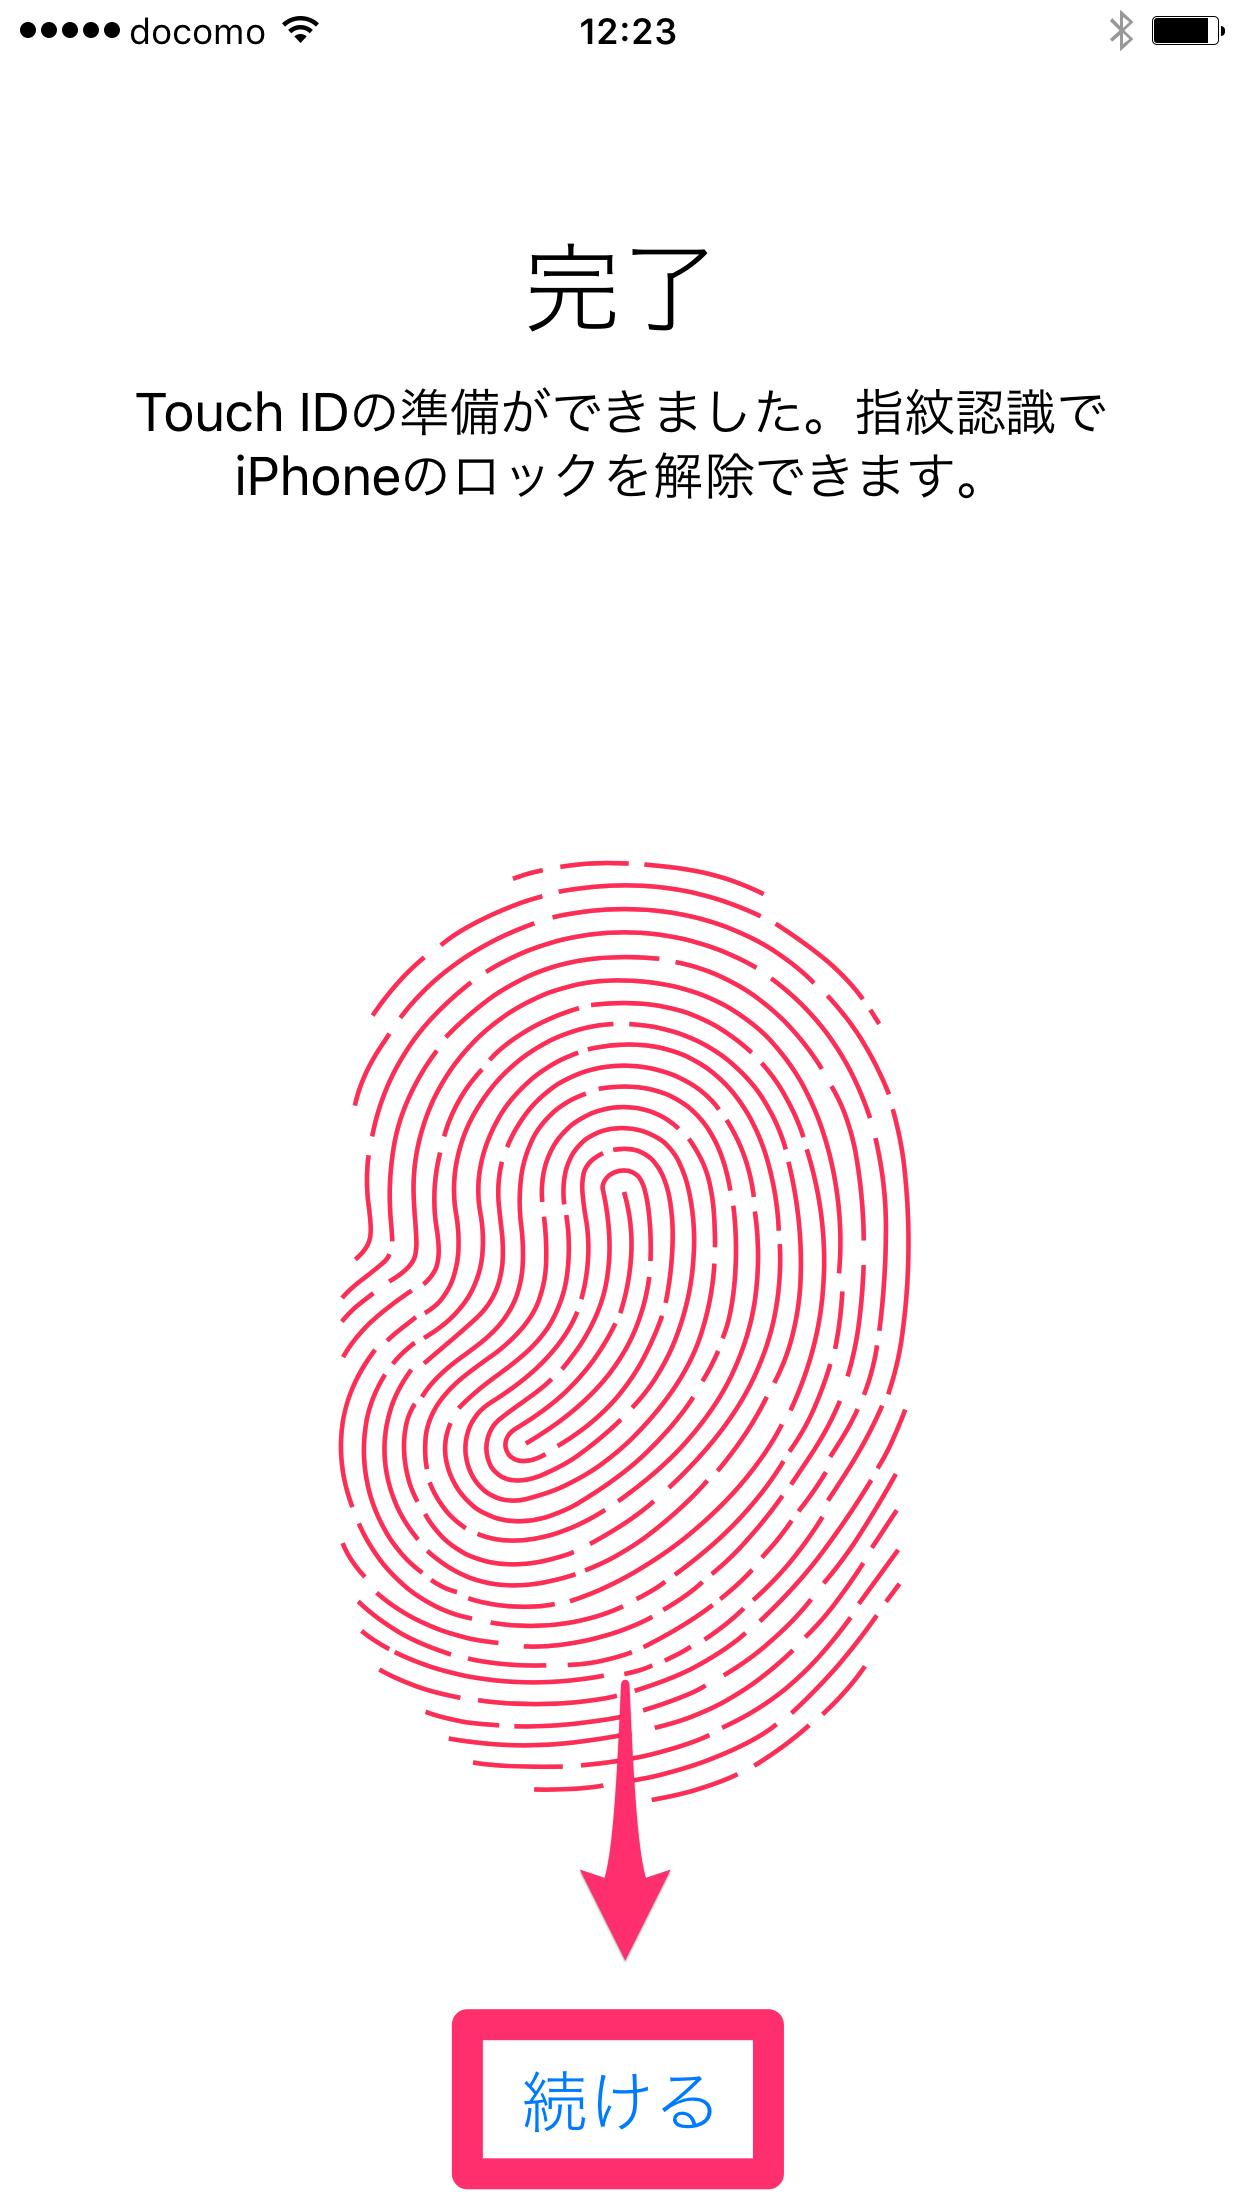 iPhoneやLINEを指紋でロック解除(Touch ID):